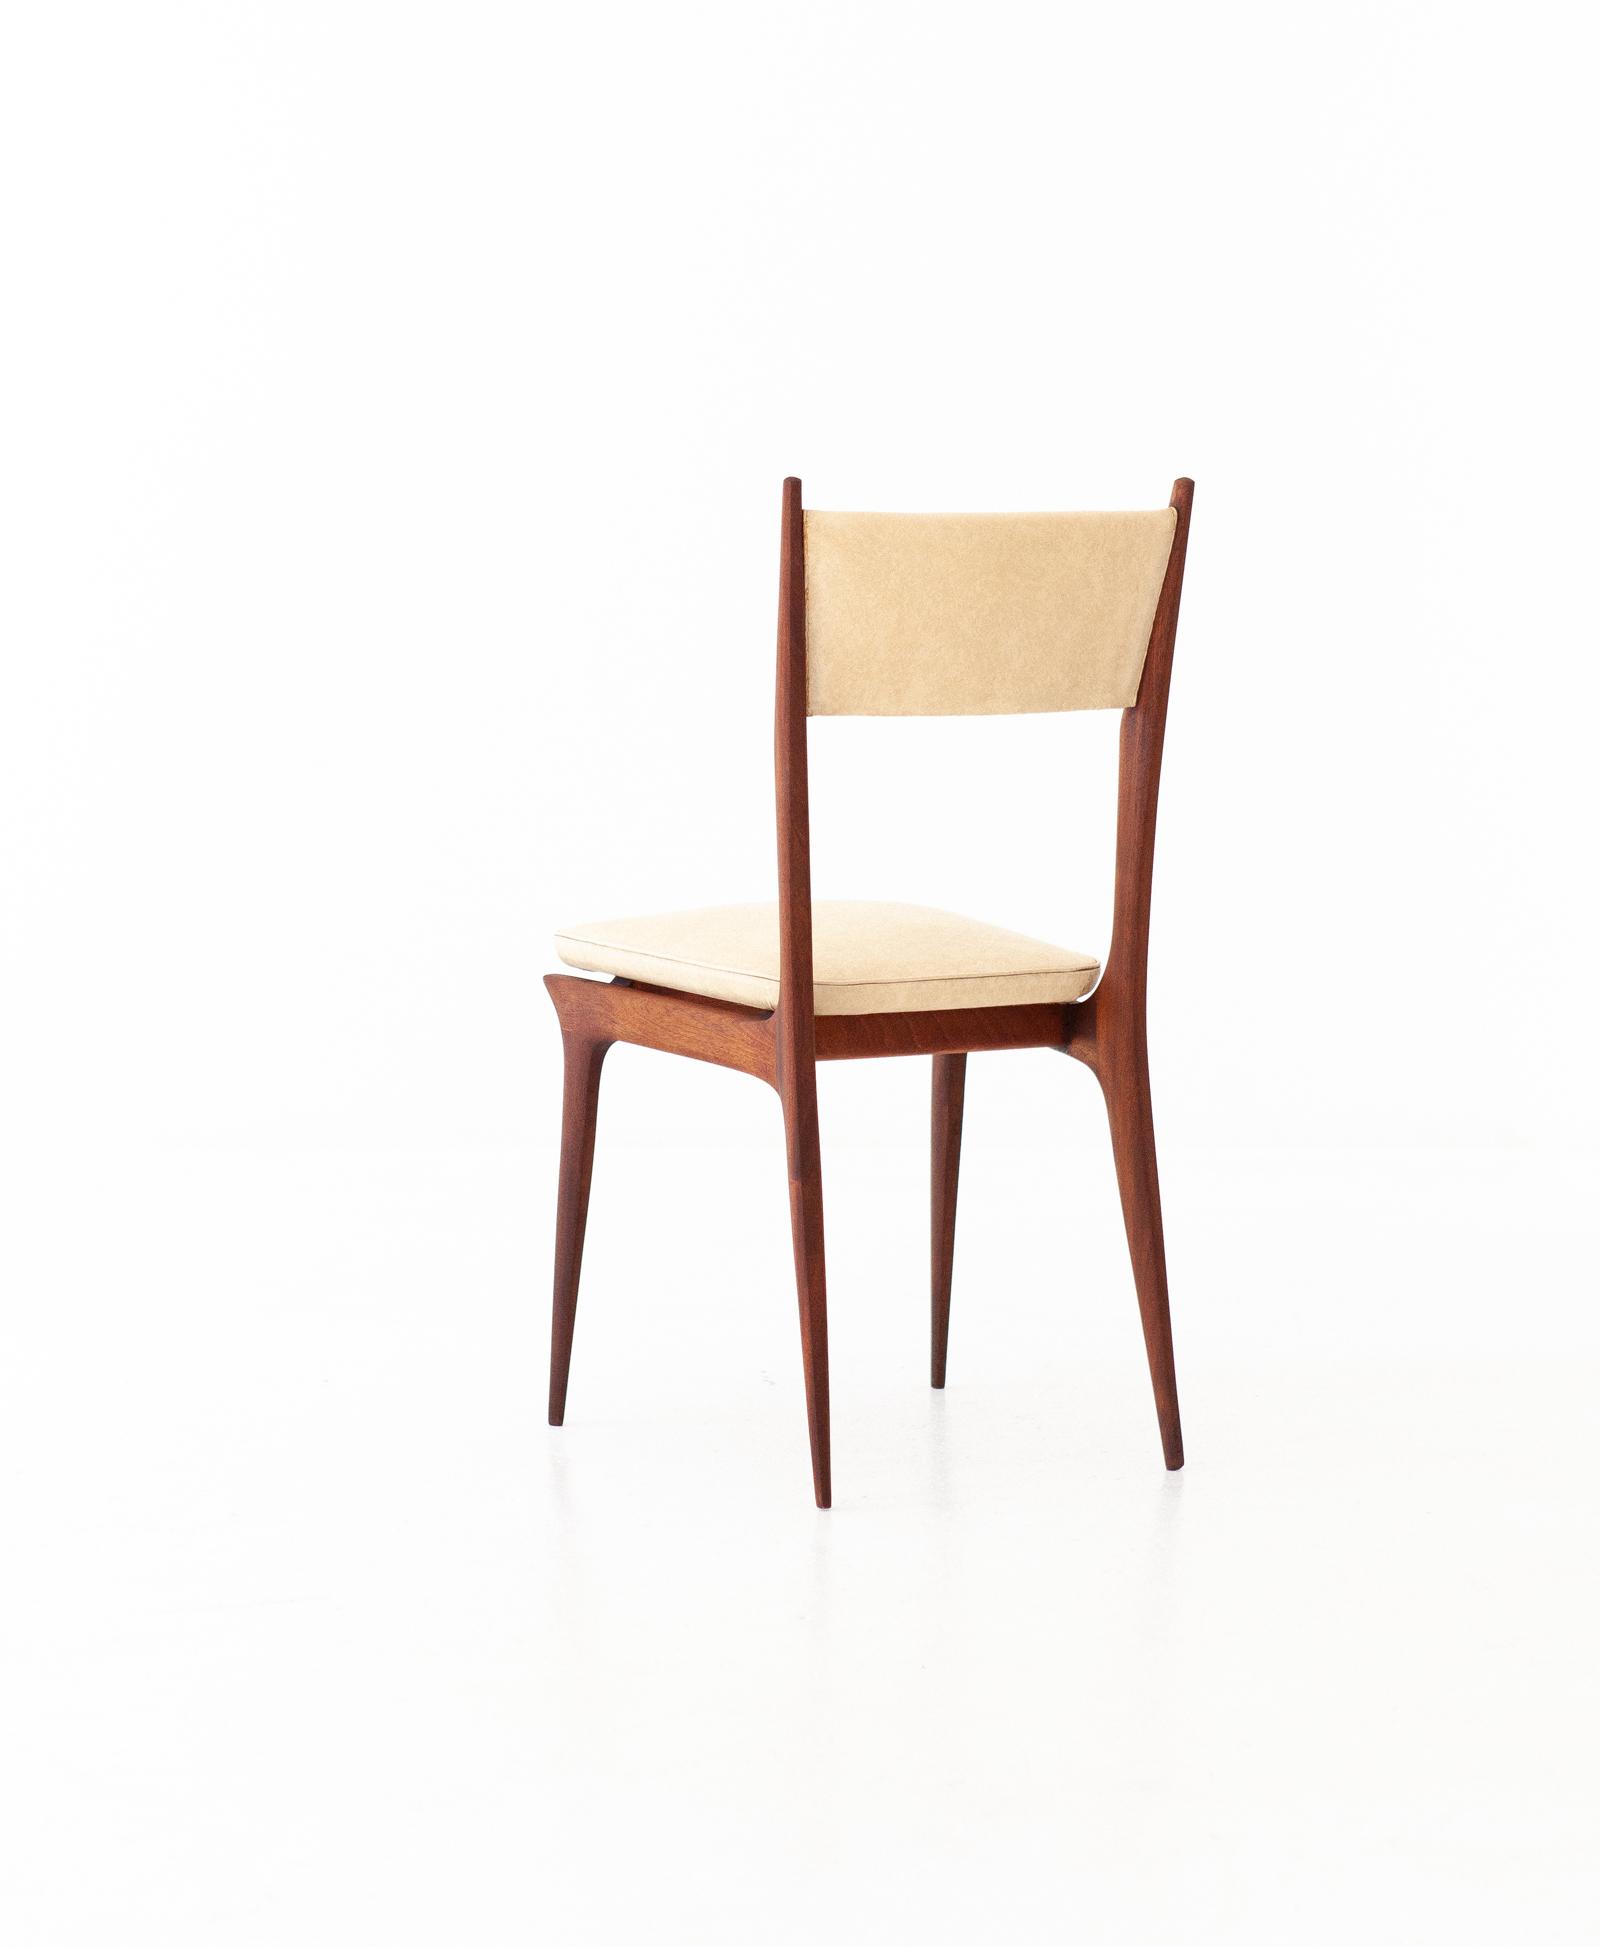 six-italian-mahogany-beige-skai-dining-chairs-4-SE281